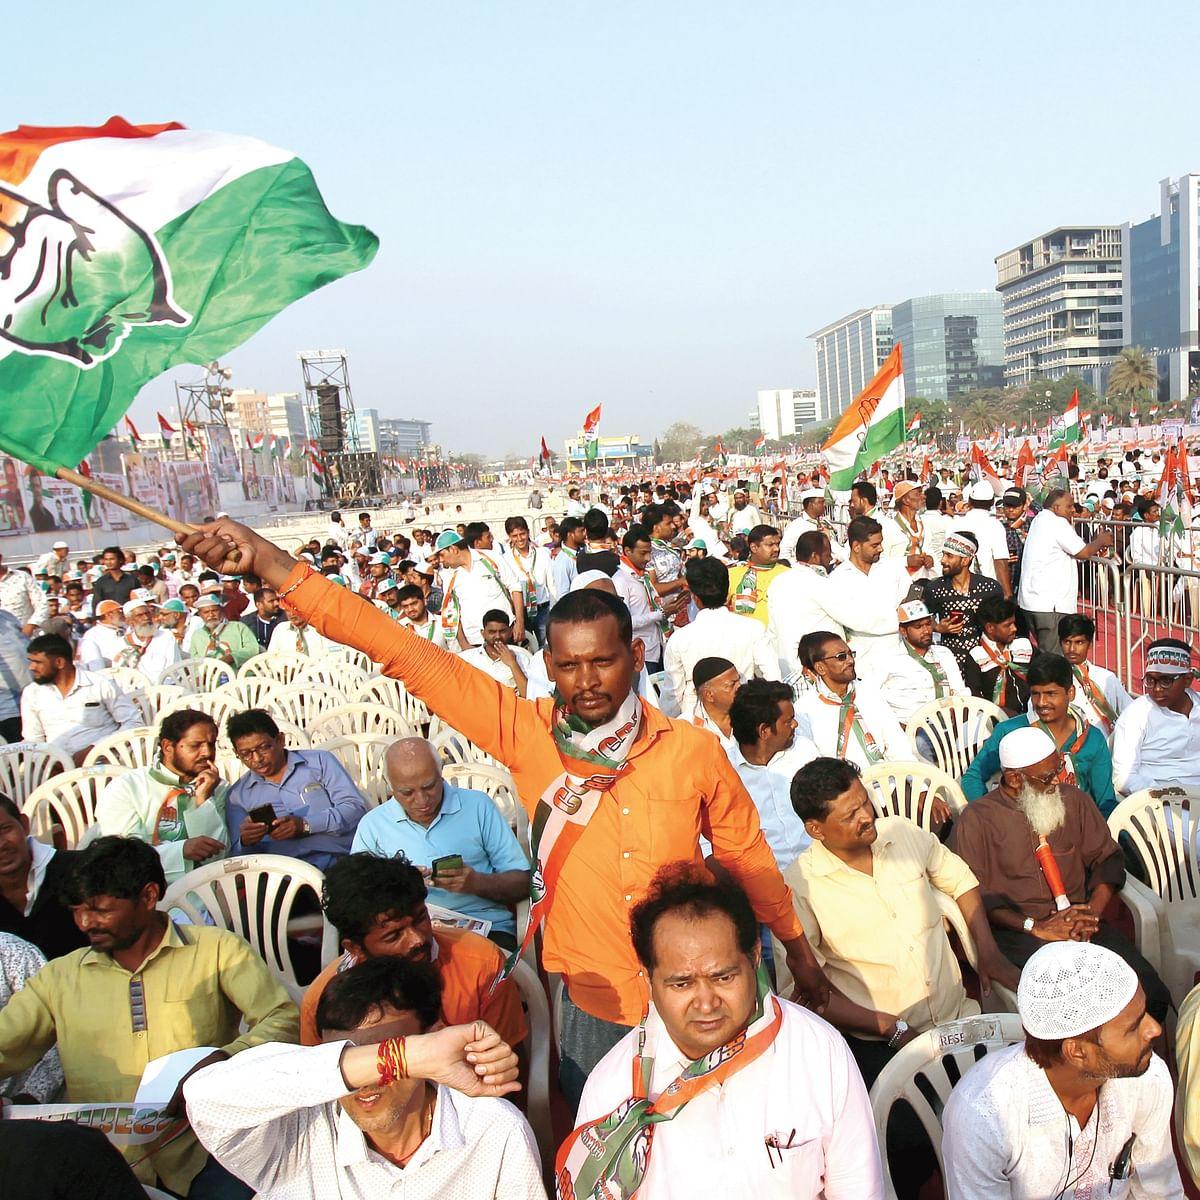 India's WhatsApp election